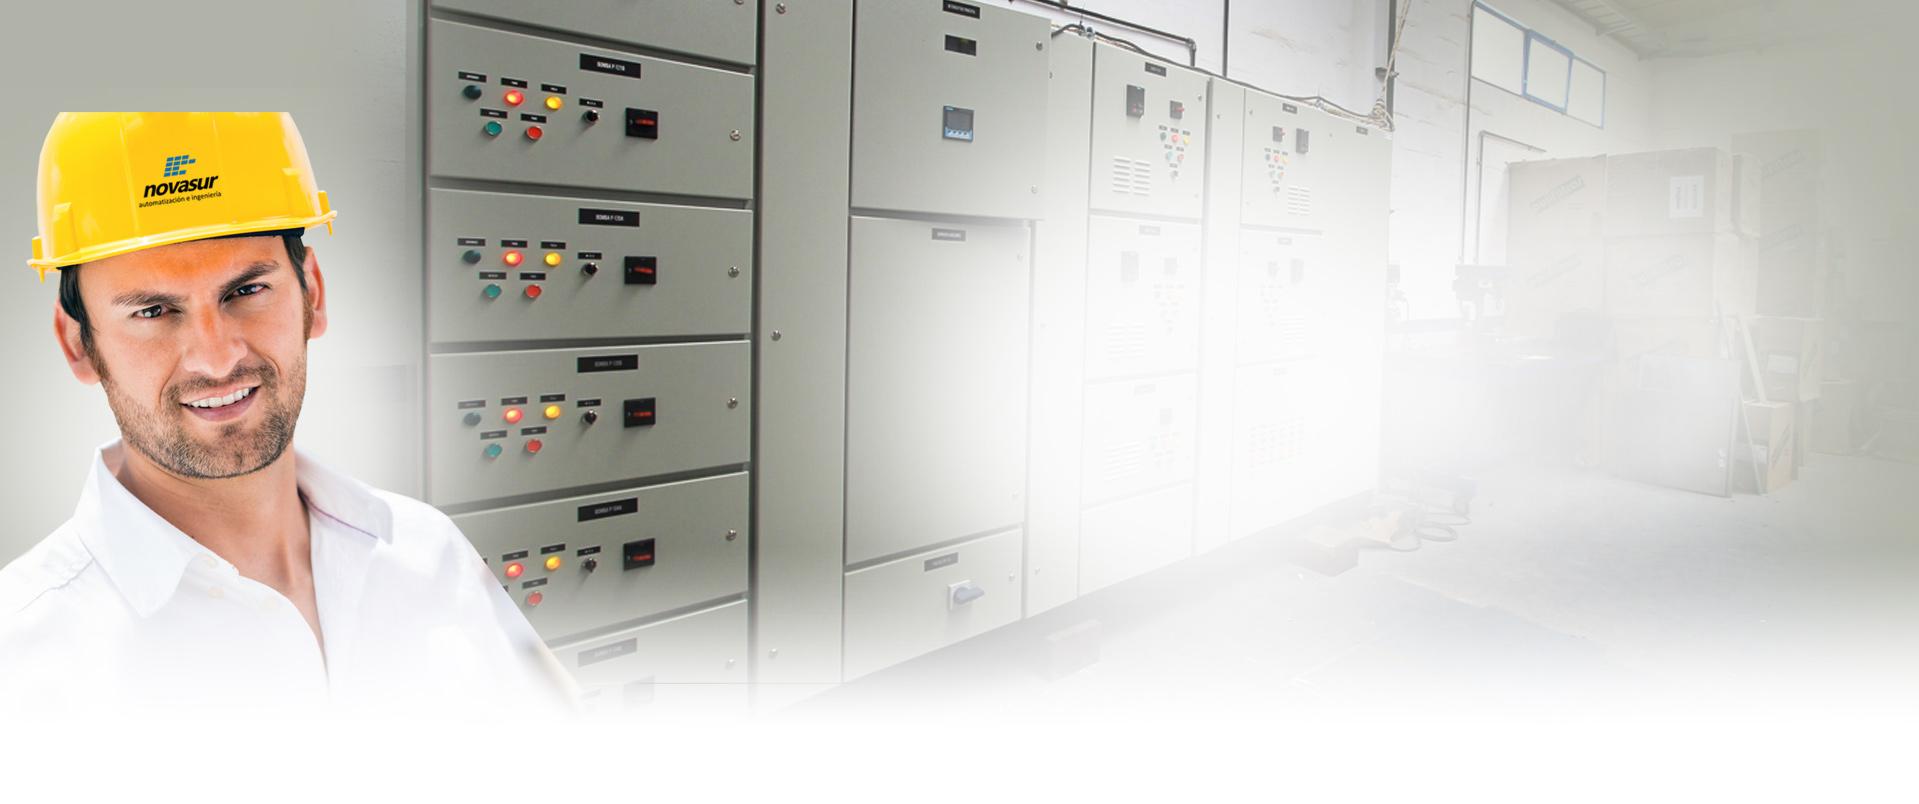 Obras eléctricas | Novasur